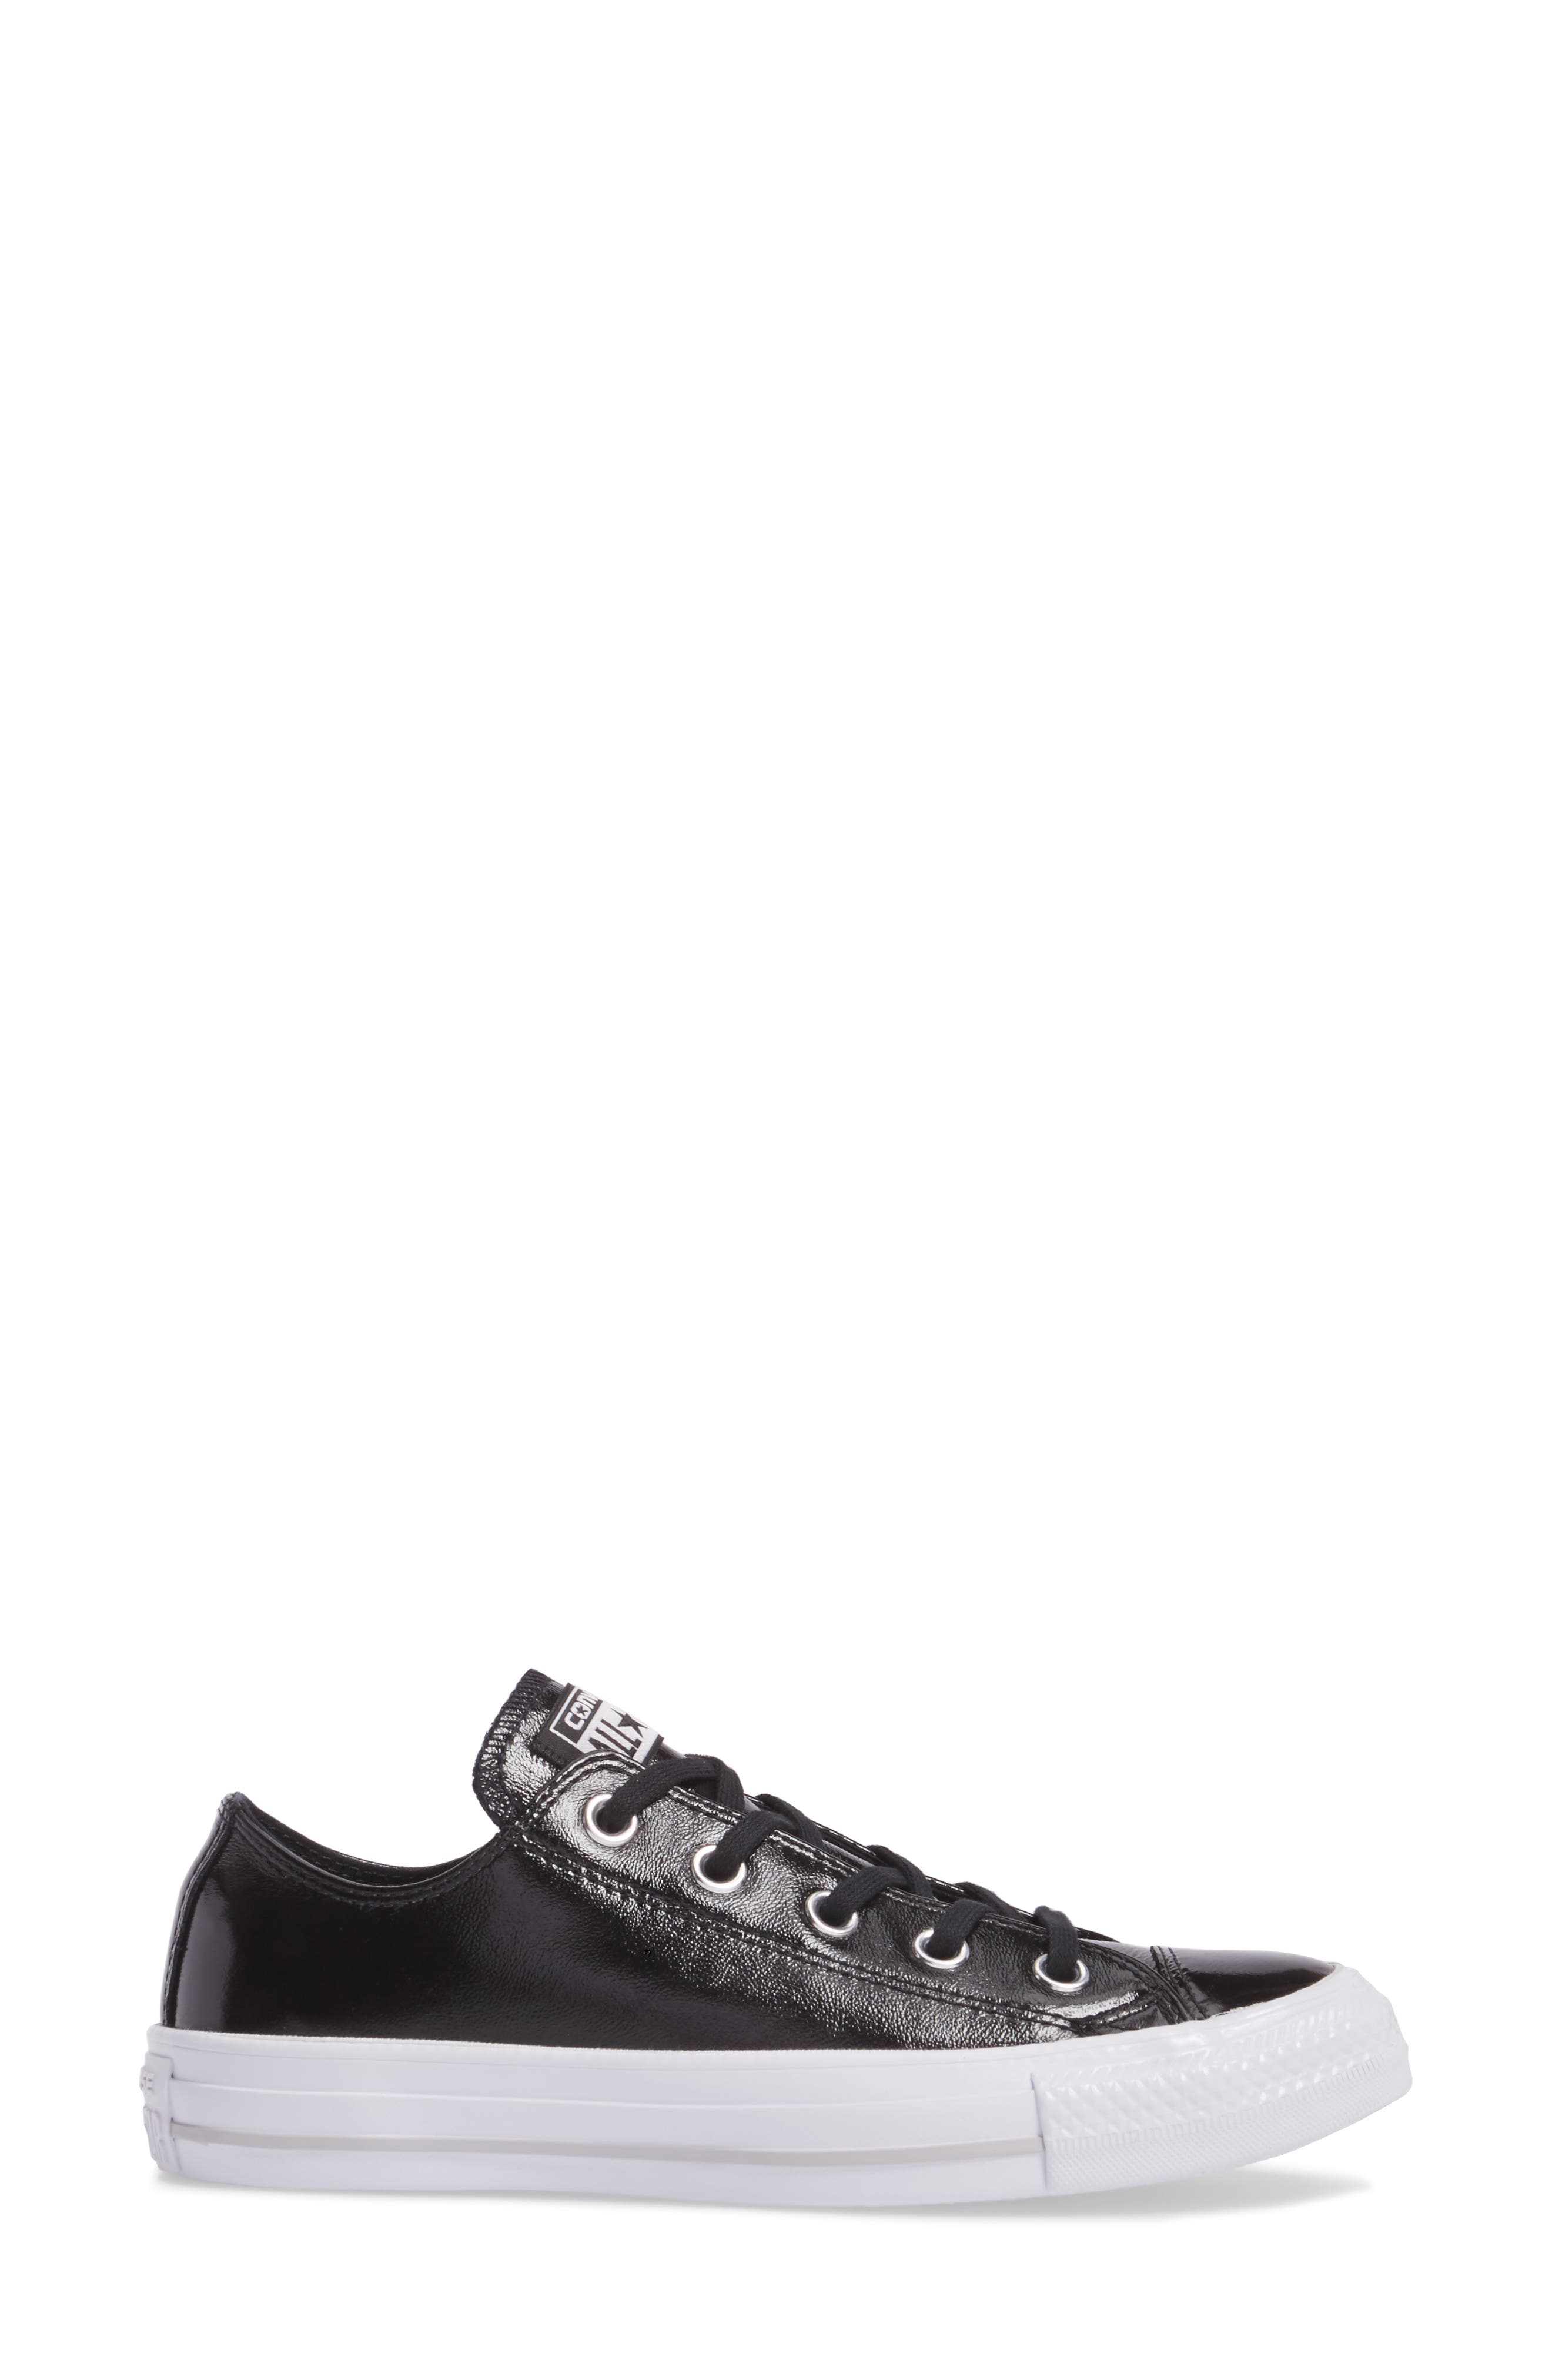 Alternate Image 3  - Converse Chuck Taylor® All Star® Seasonal Ox Low Top Sneaker (Women)